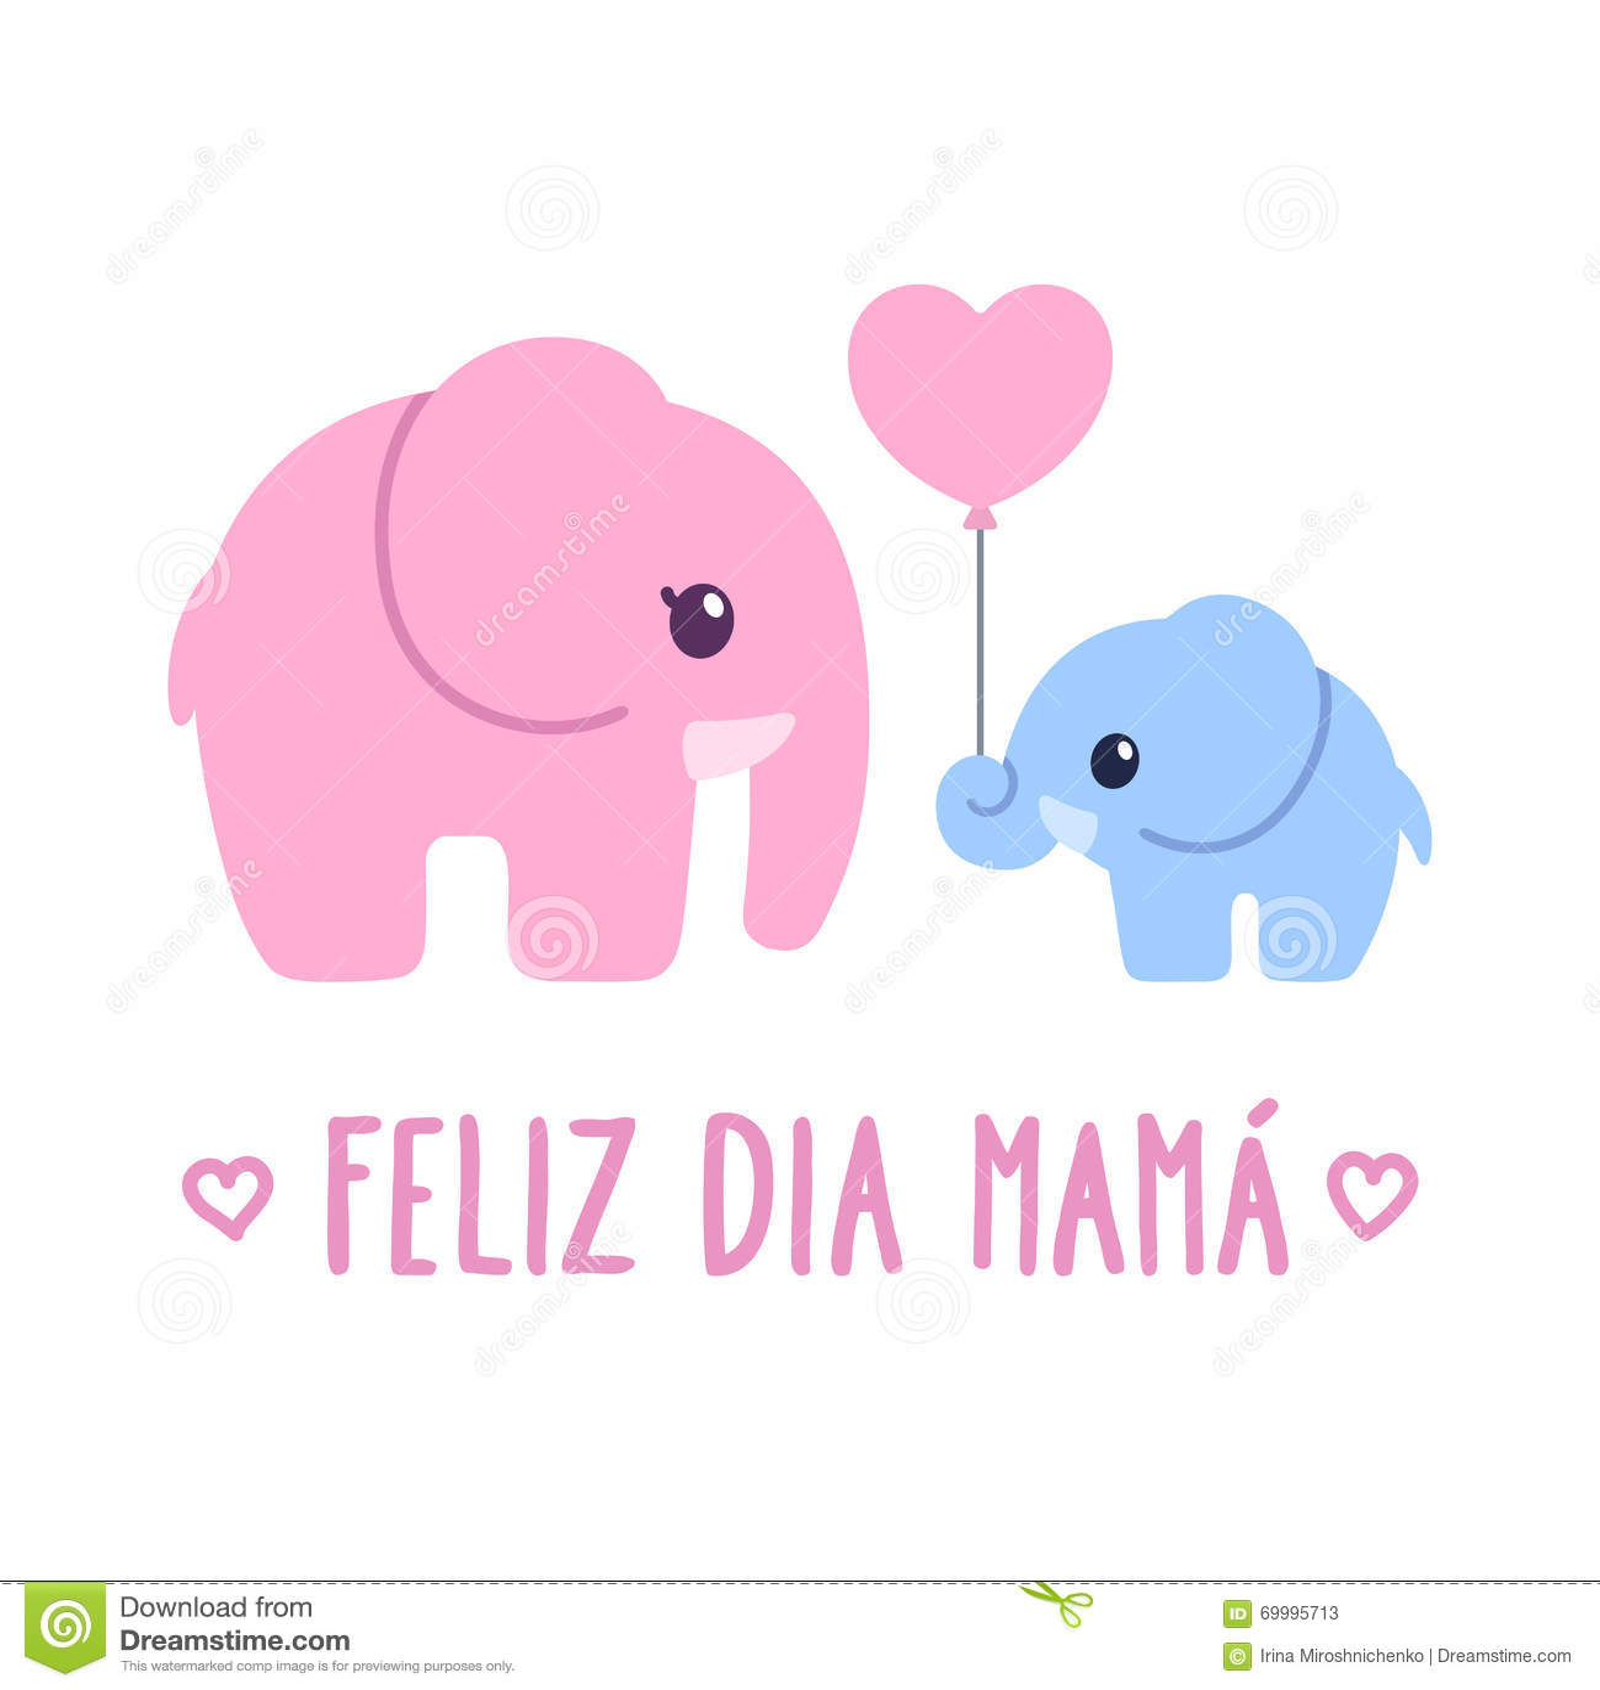 Feliz Dia Mama Stock Vector - Image: 69995713 Feliz Dia Mama